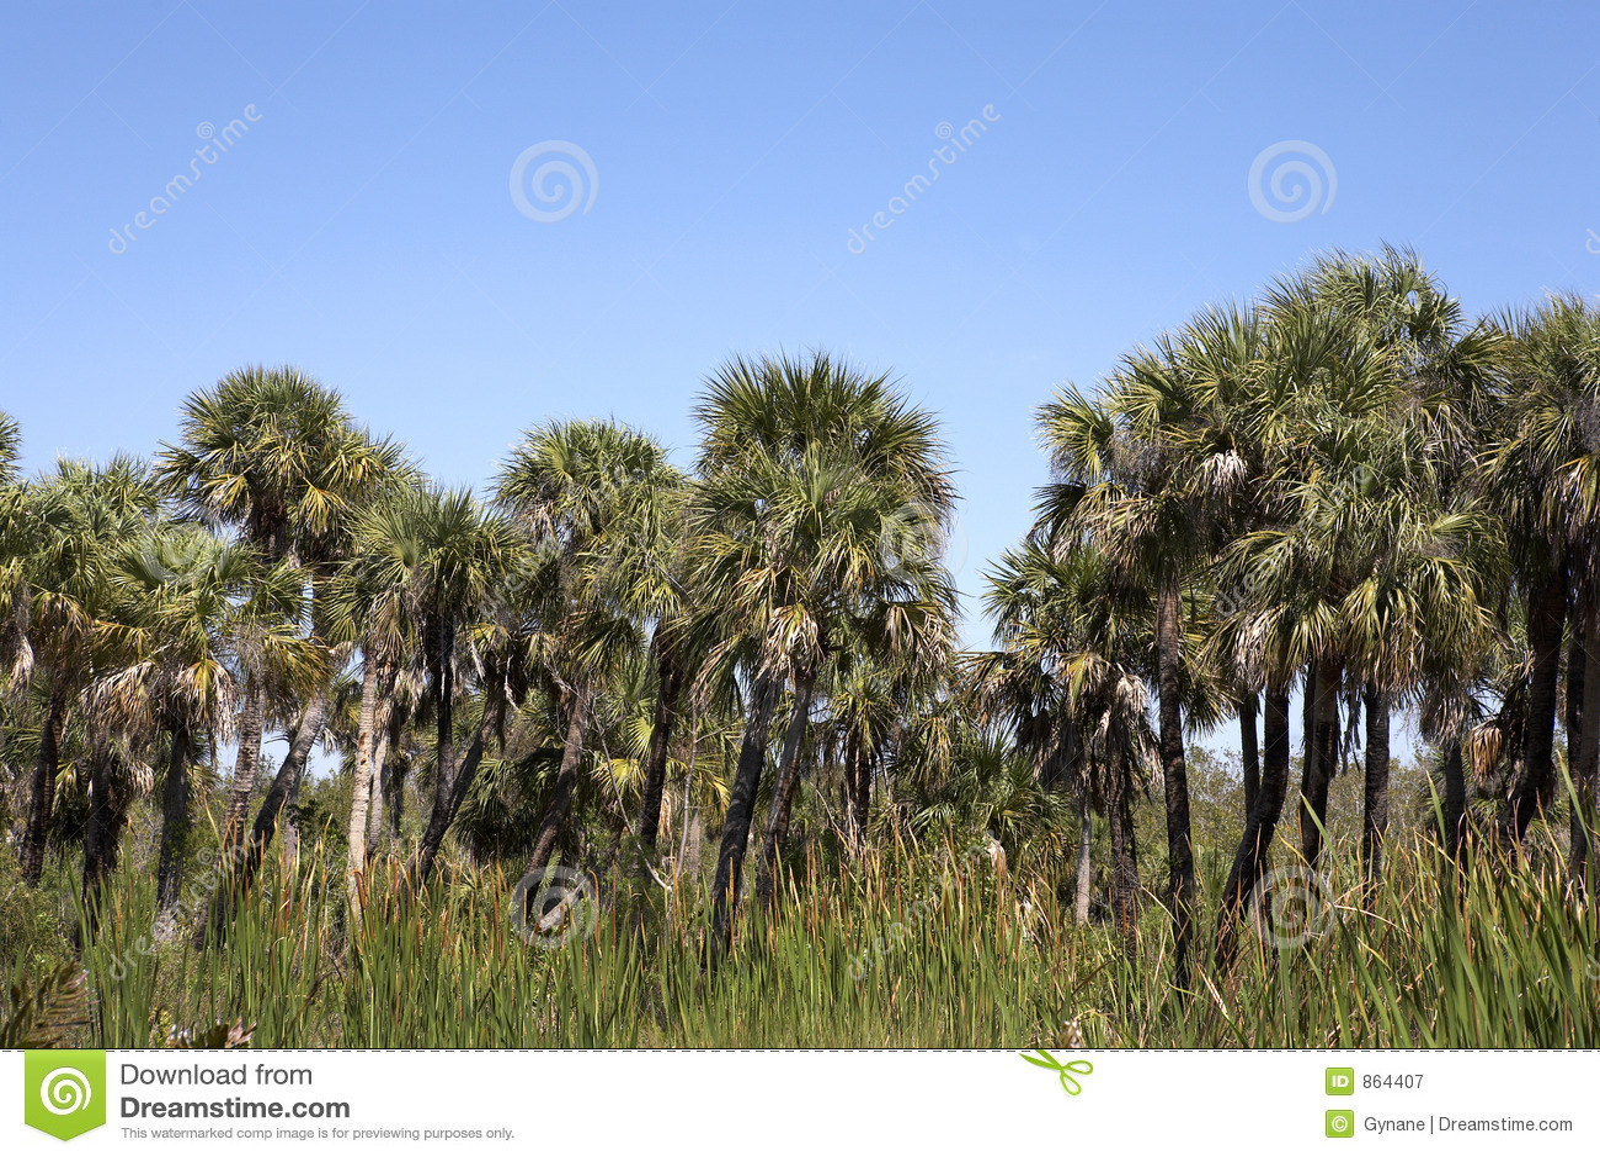 Line palm tree view